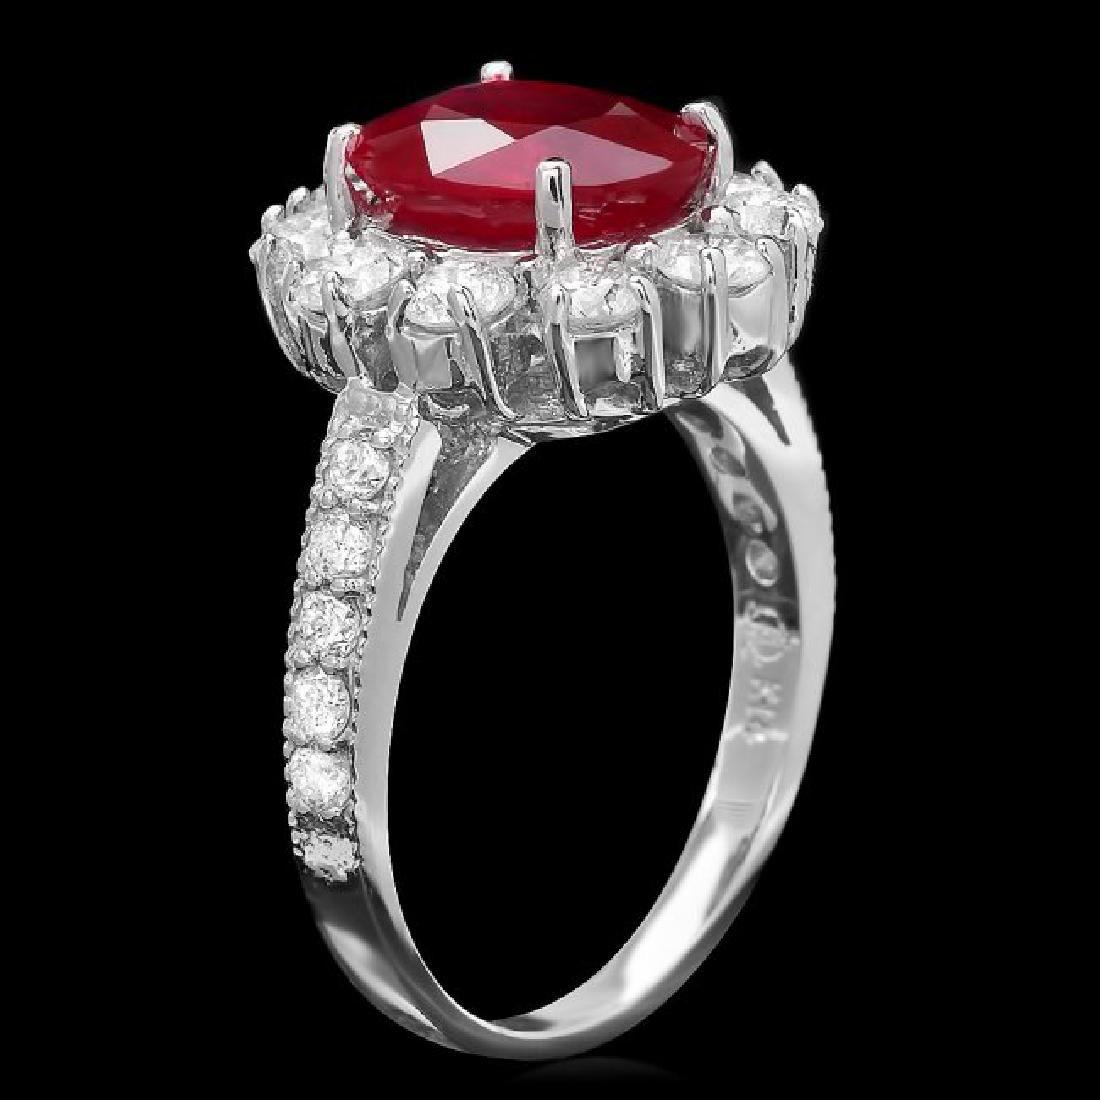 14k White Gold 3.20ct Ruby 1.50ct Diamond Ring